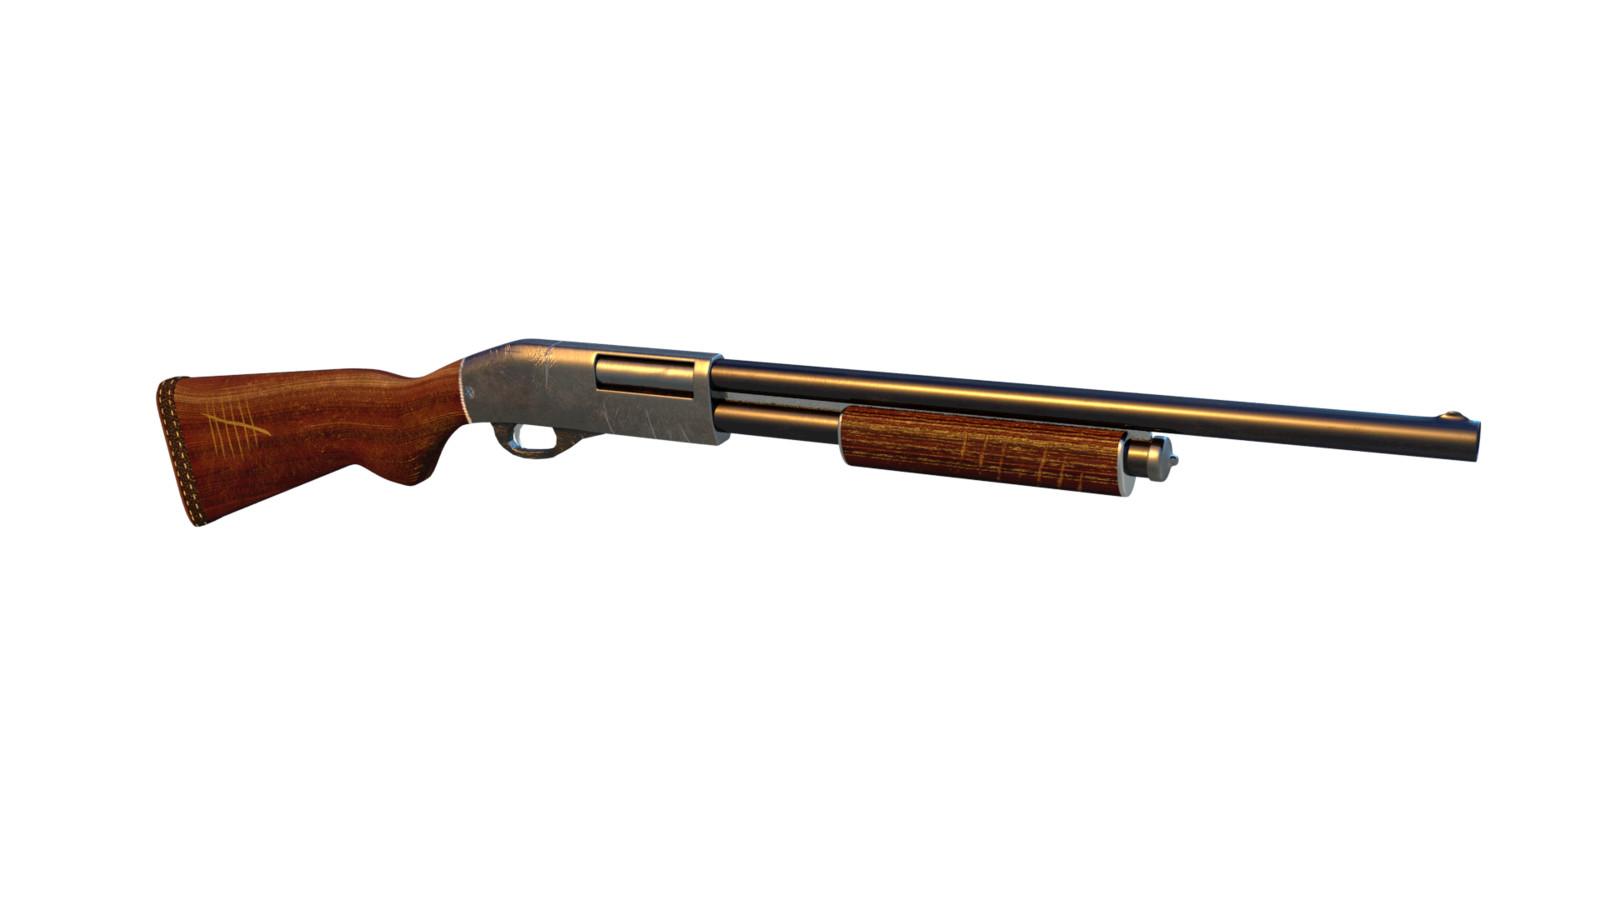 Granny's shotgun, quick modelling and texturing